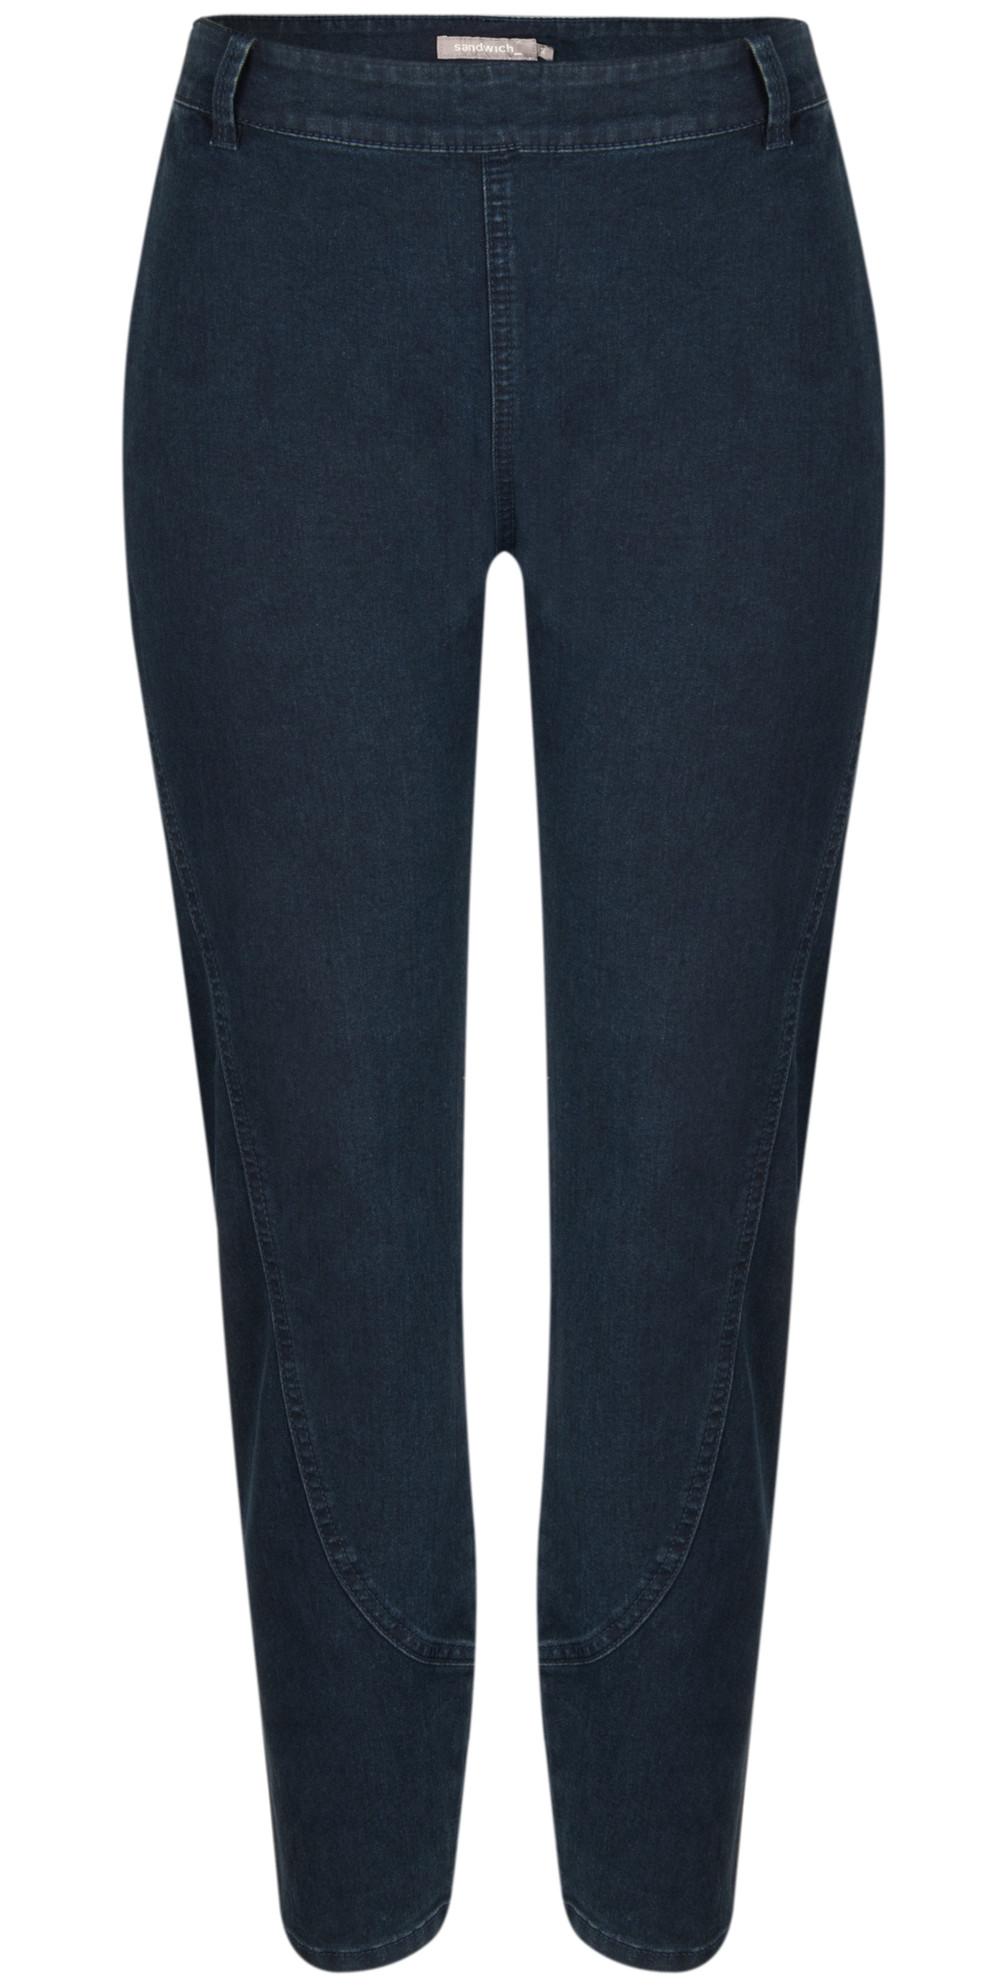 Sandwich Clothing Denim Tregging Pants in Dark Blue